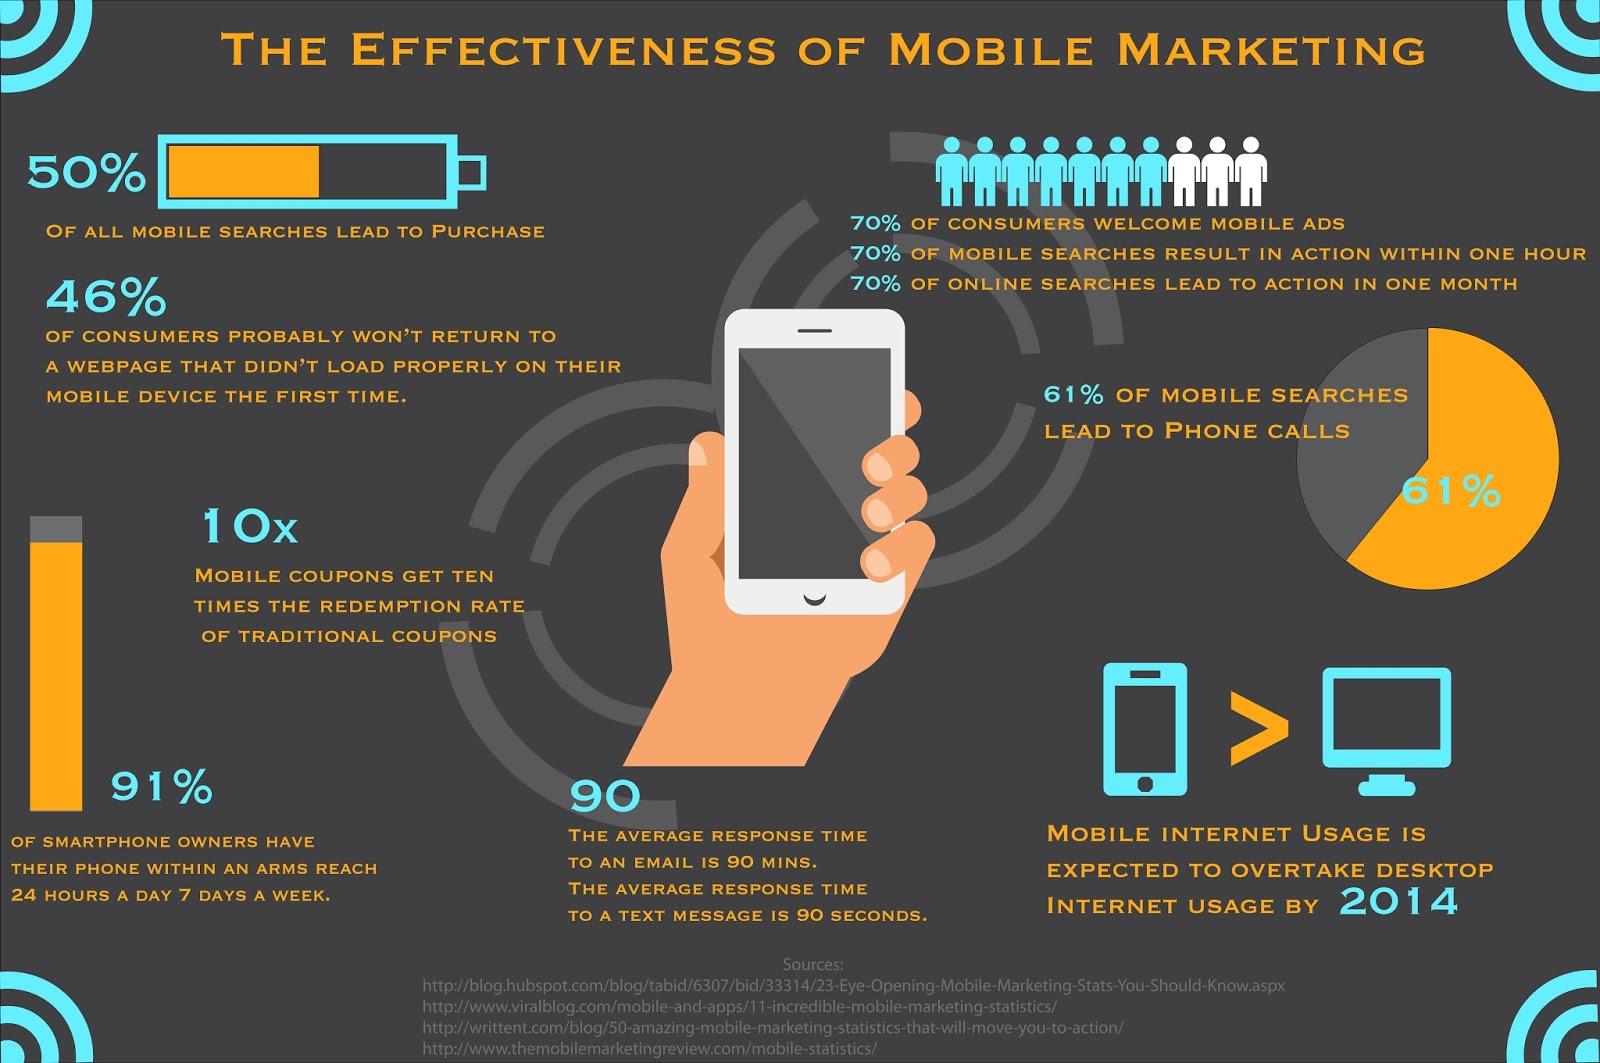 Mobile Marketing effectiveness